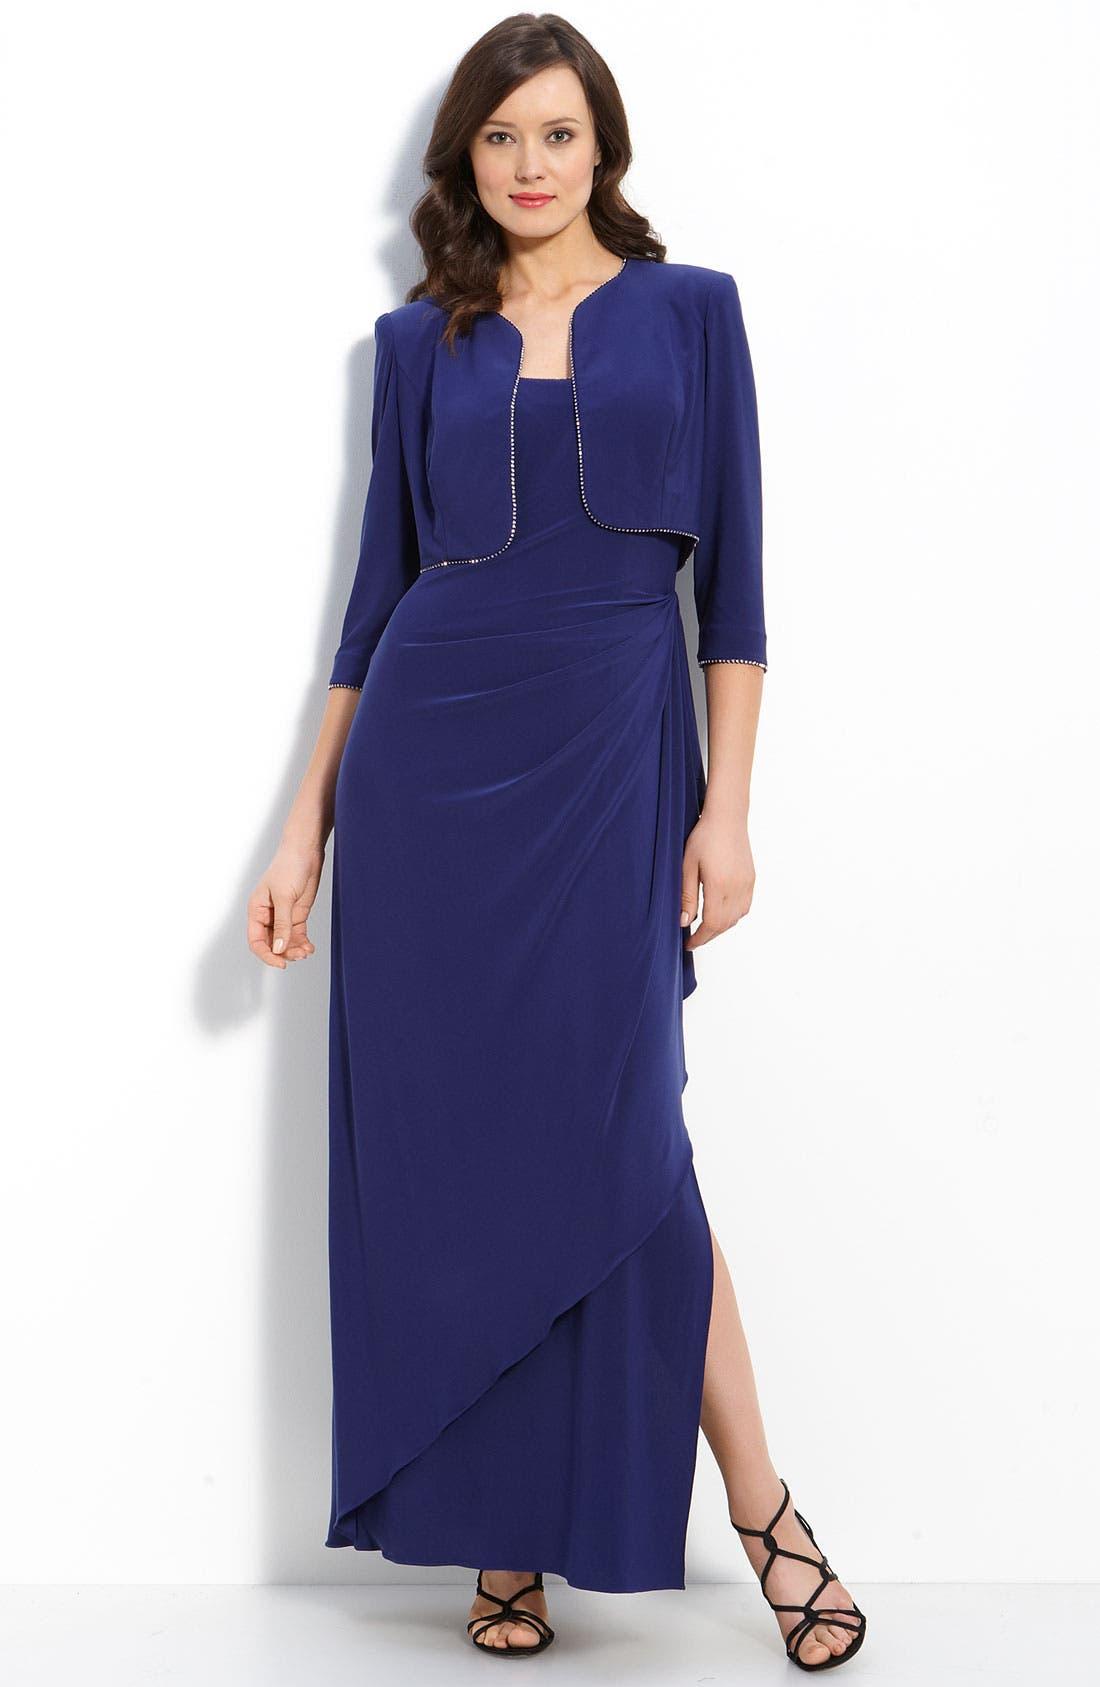 Main Image - Alex Evenings Rhinestone Trim Jersey Dress & Bolero